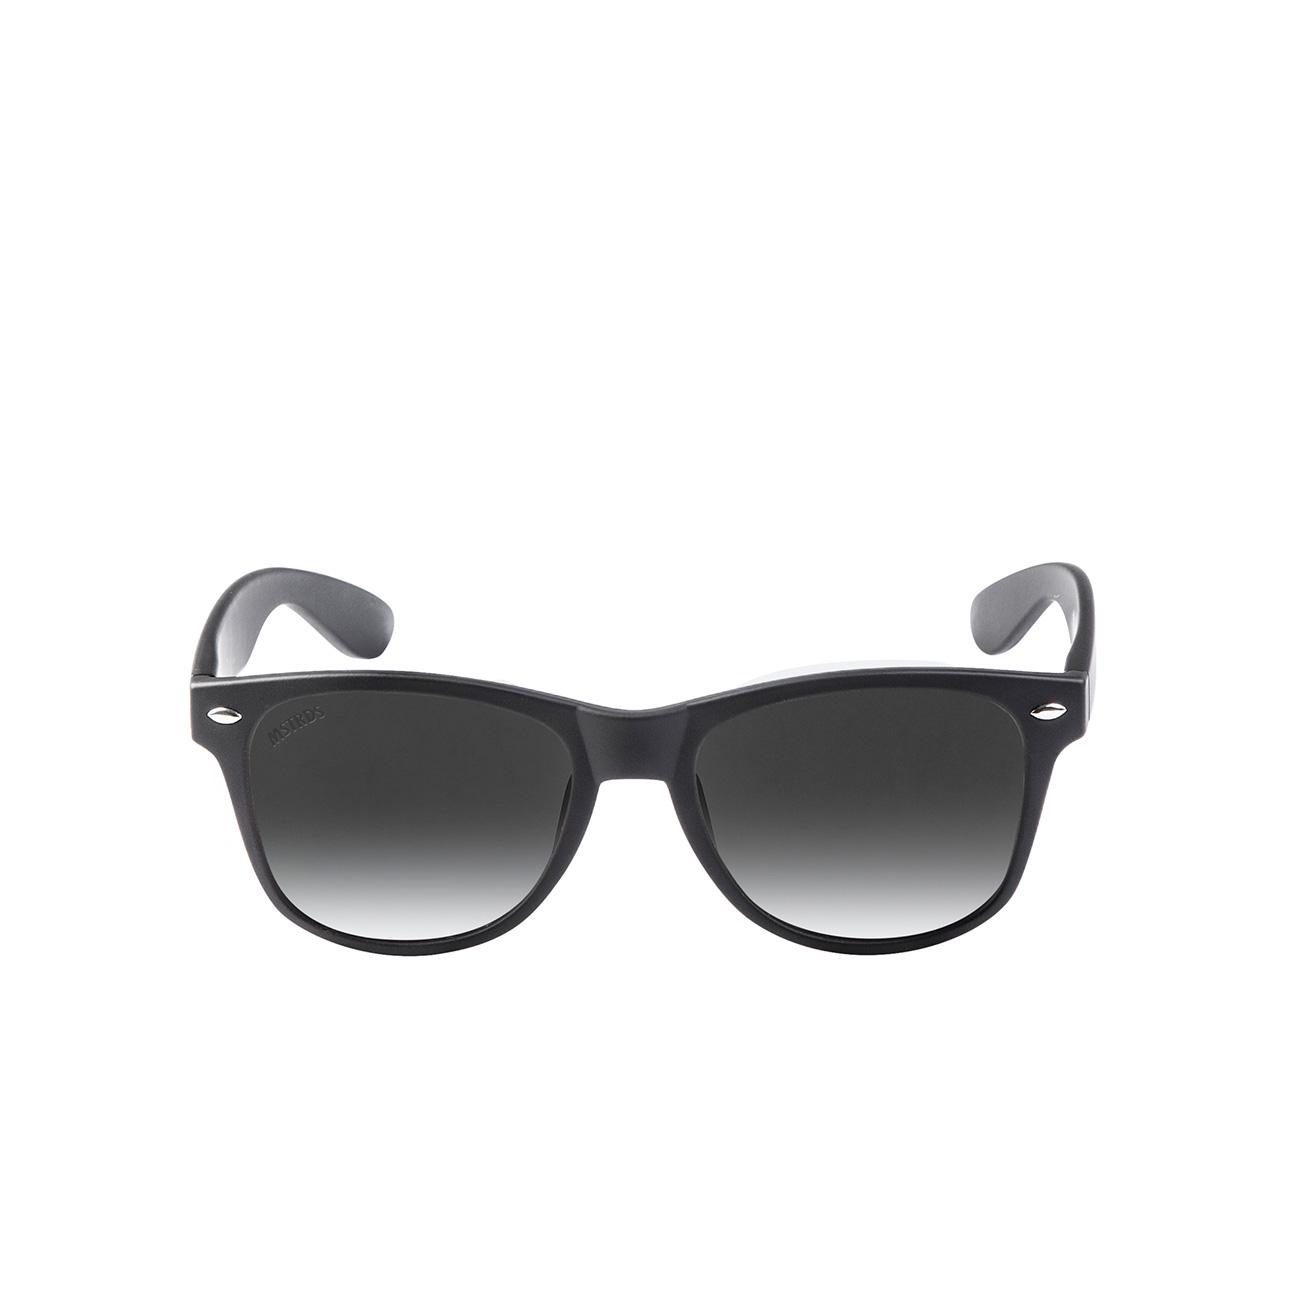 Masterdis Sunglasses Likoma Youth Herren Sonnenbrille Schwarz Grün EPyyN